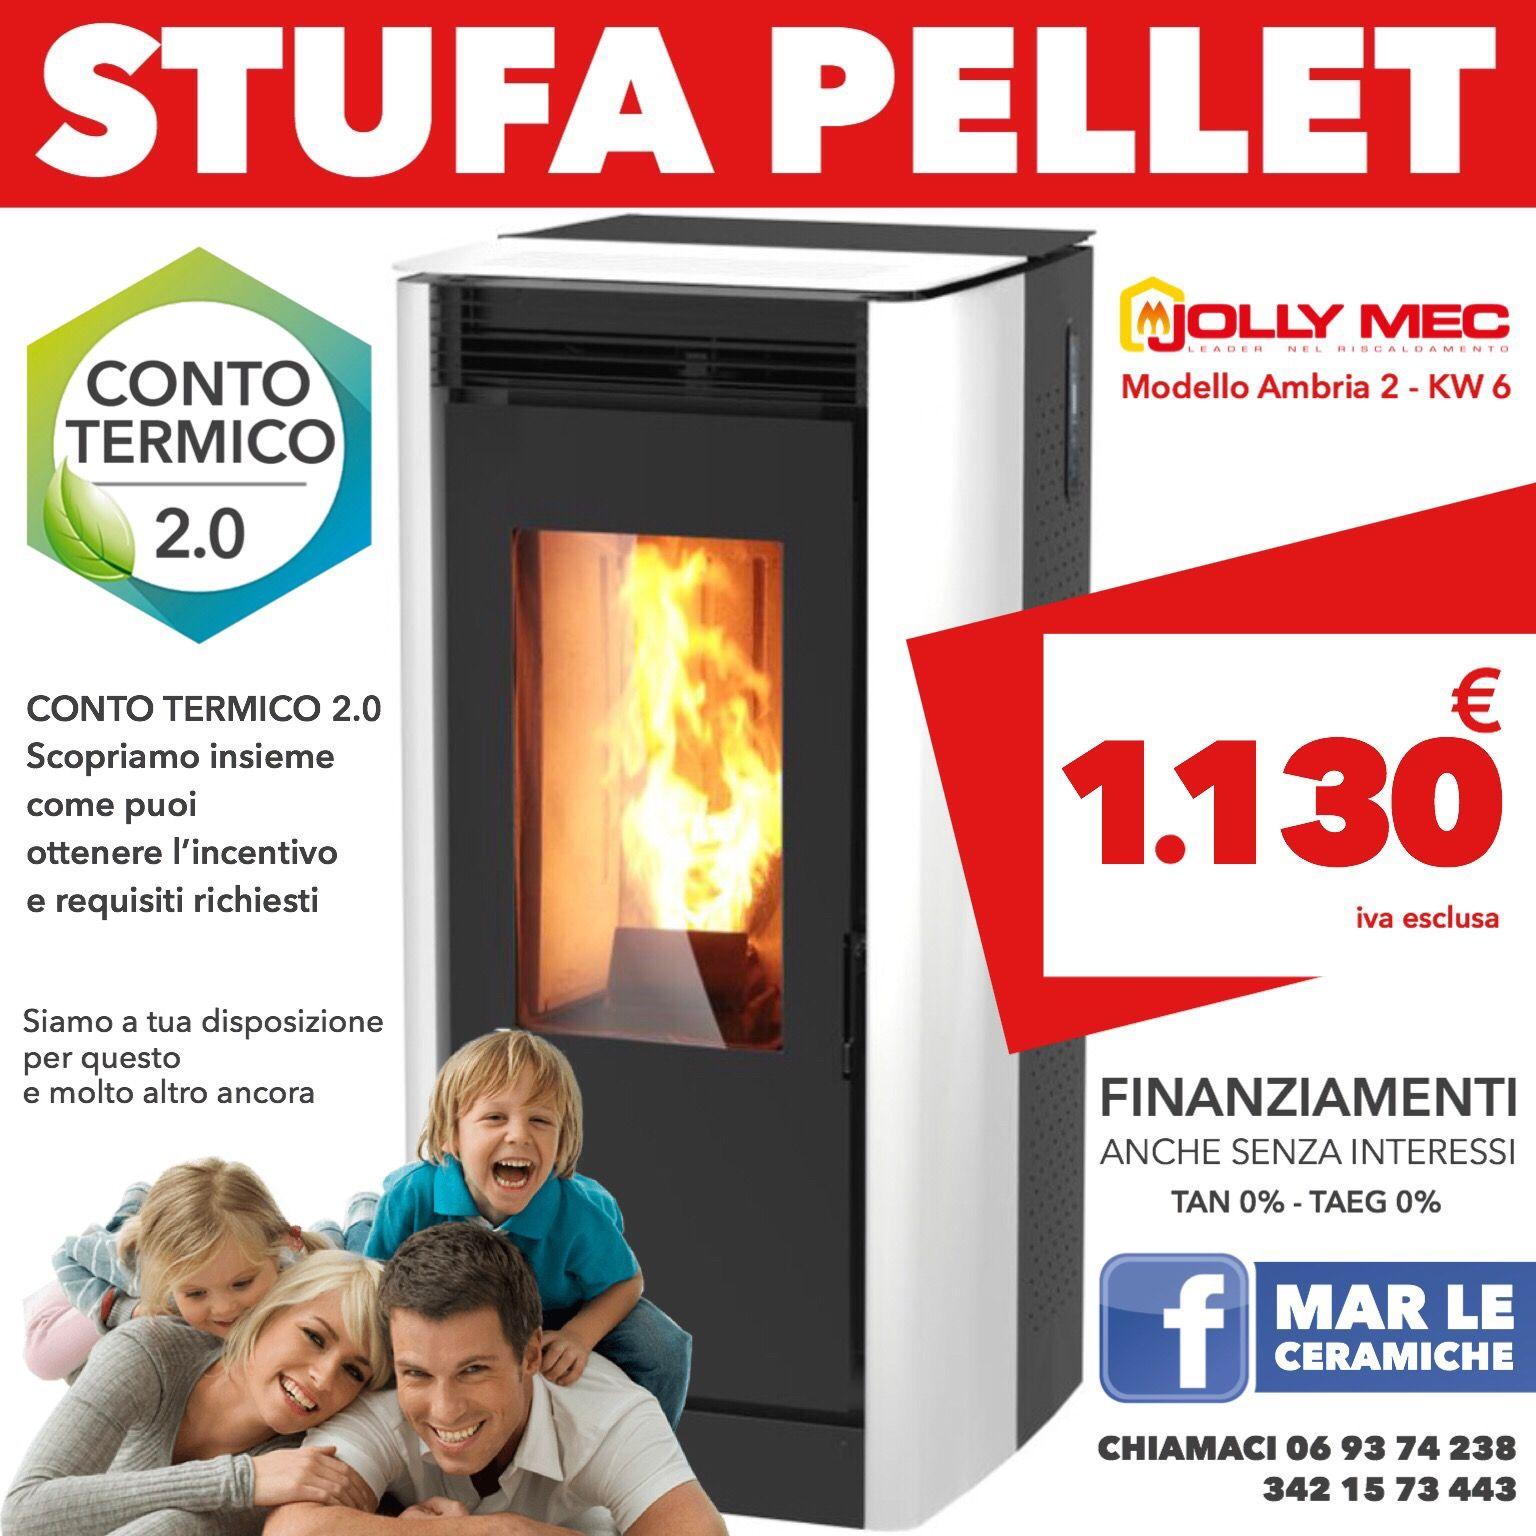 Stufa PELLET offerta jolly mec Ambria 2 prezzo € 1.130 6 KW ...